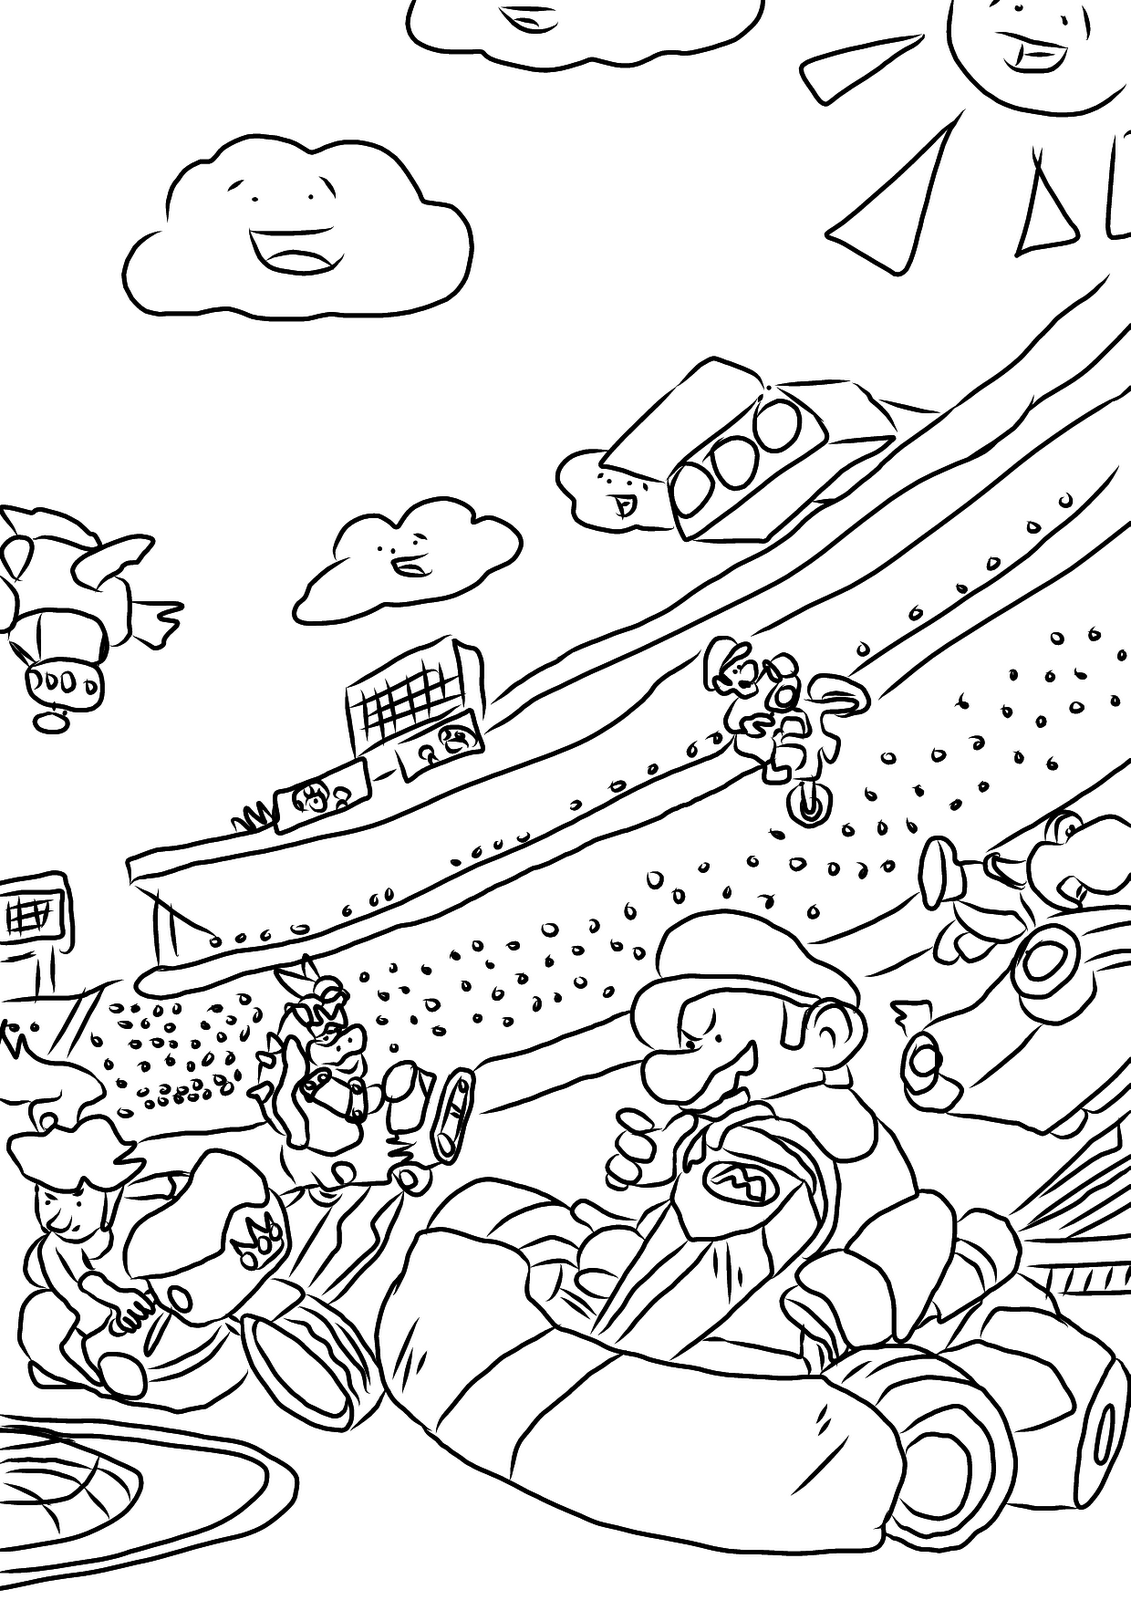 Mario Kart Coloring Page Printable